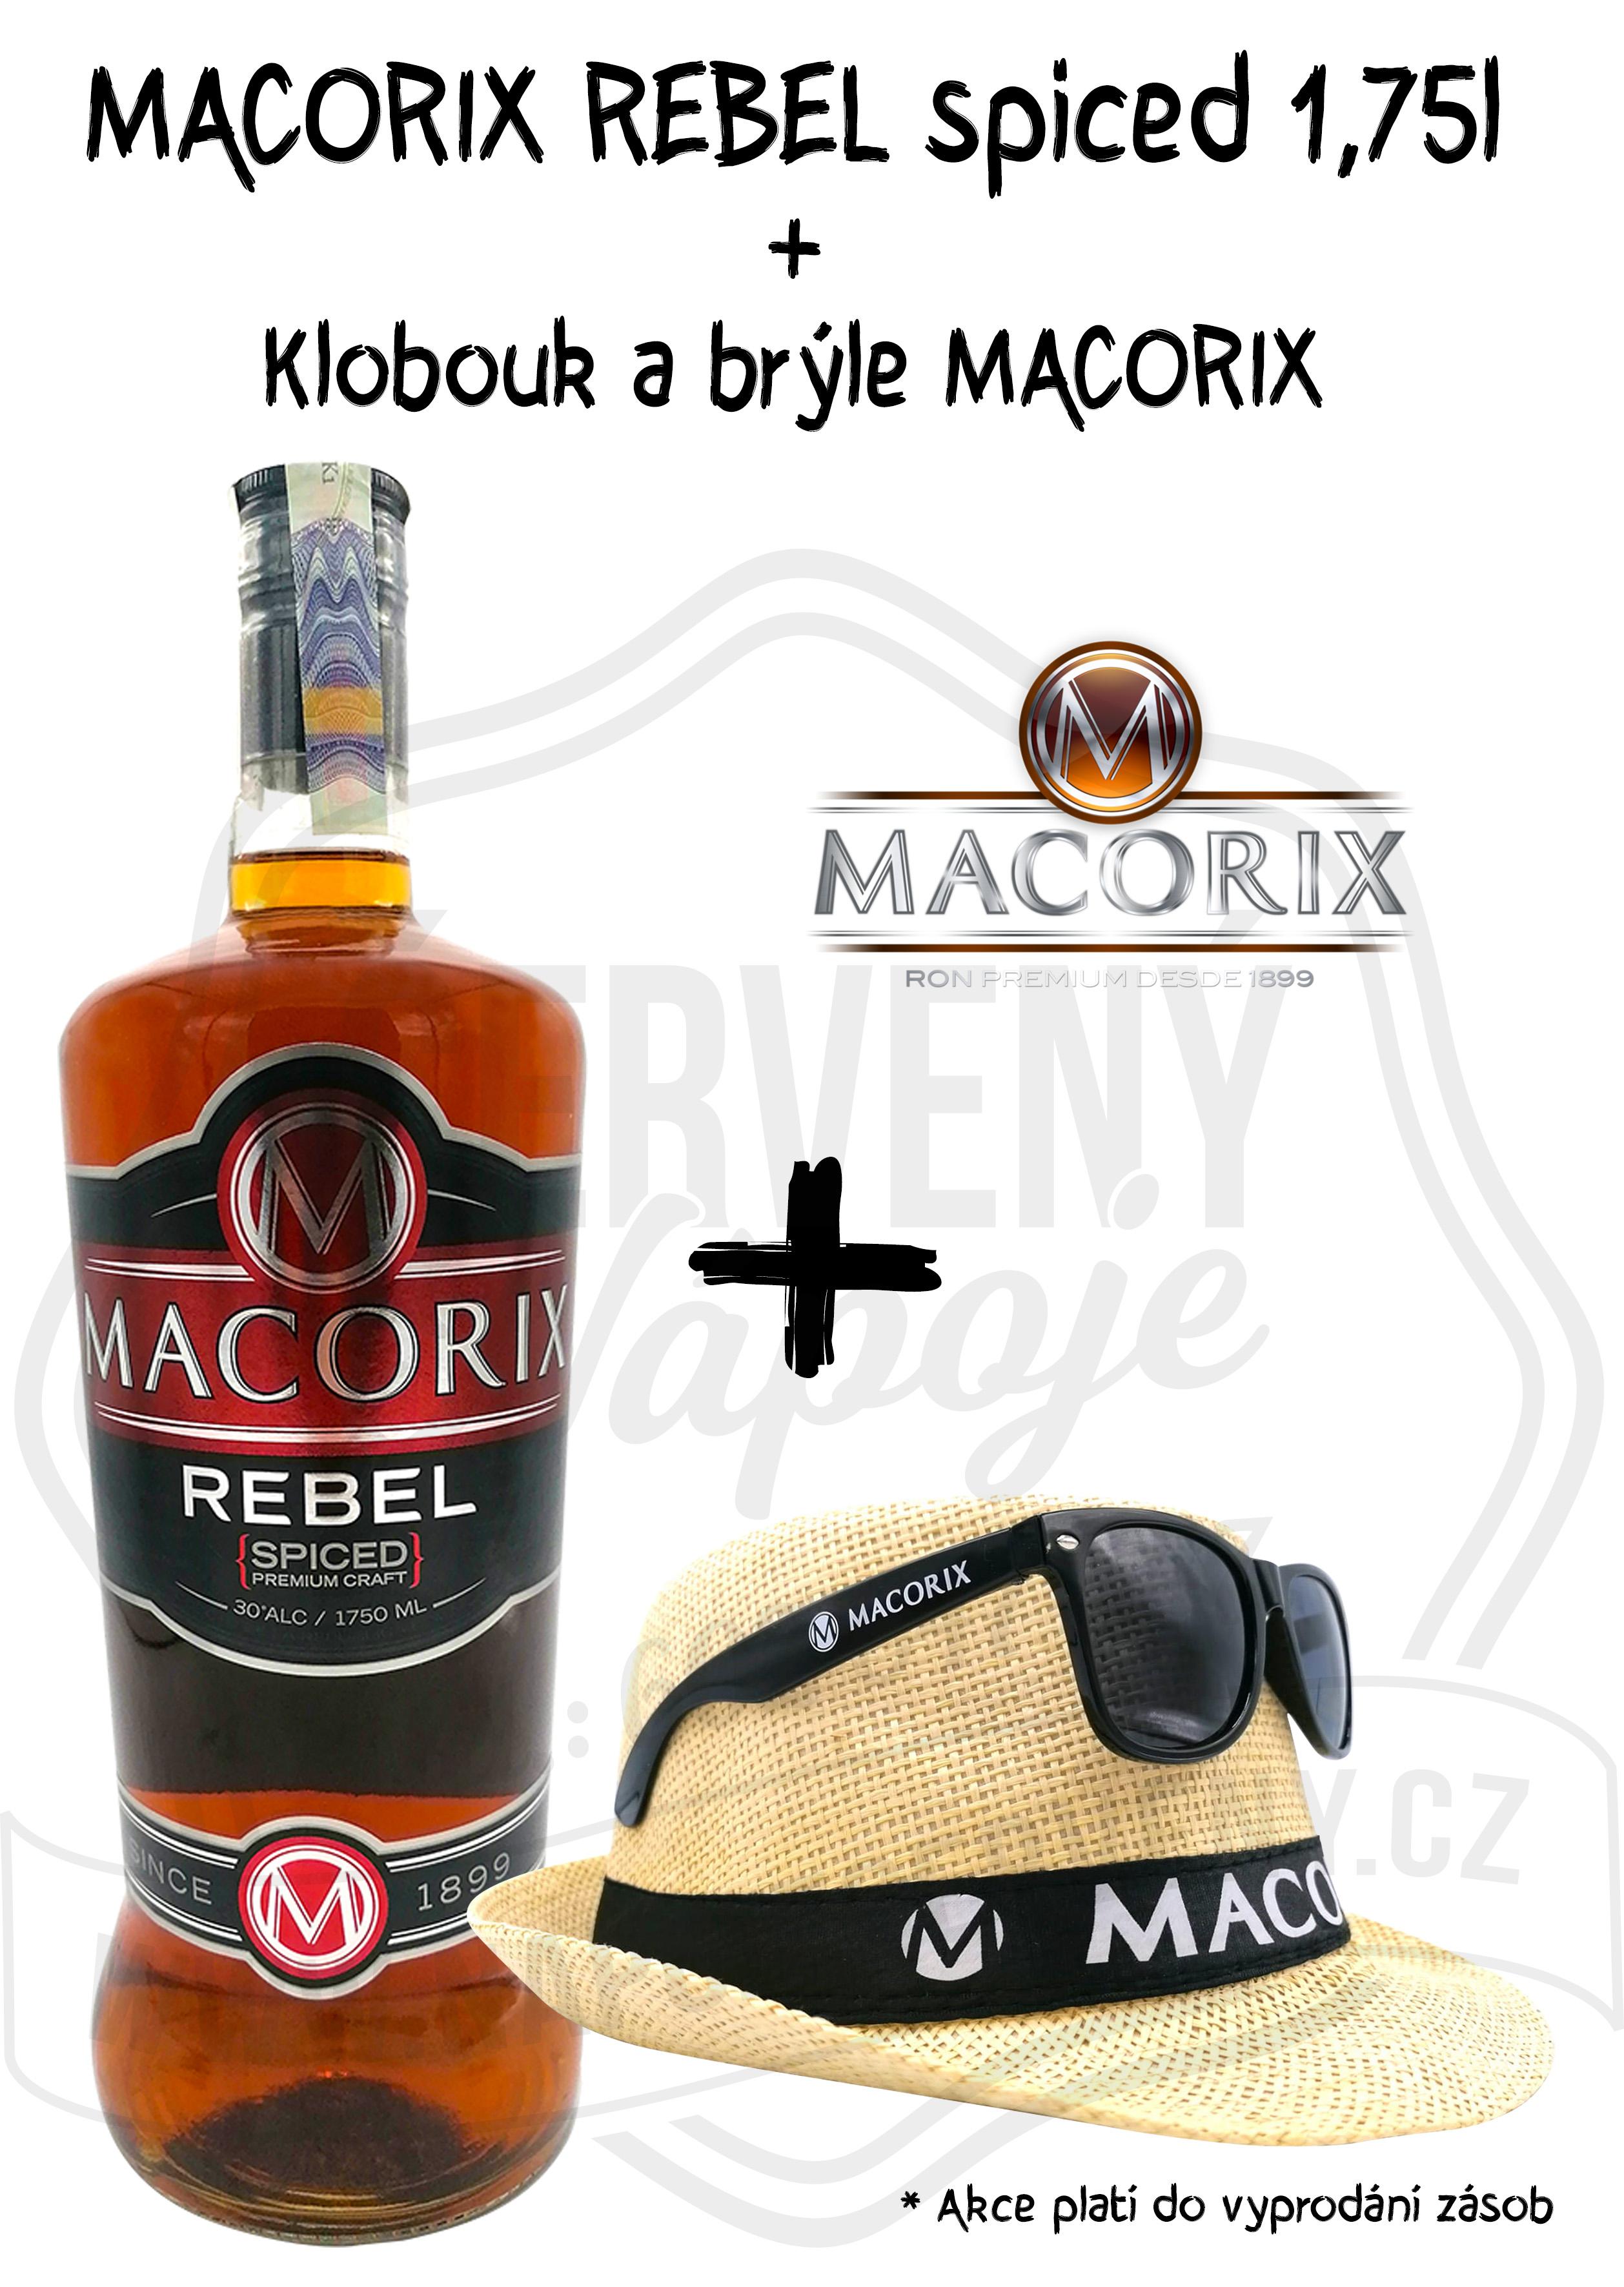 macorix-rebel-spiced-rum-klobouk-brýle